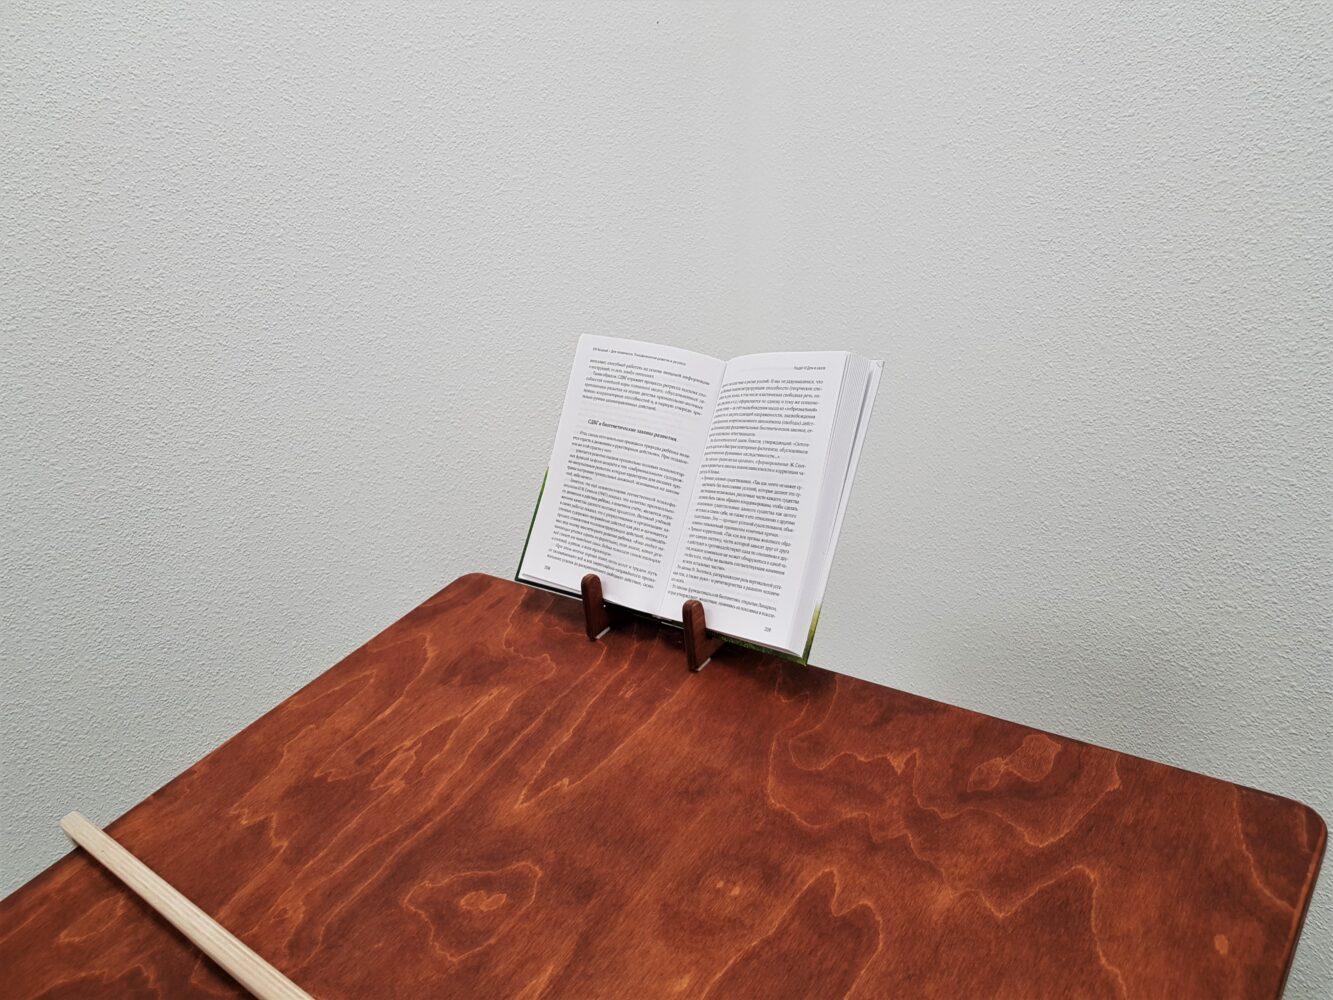 Съёмная подставка для книг